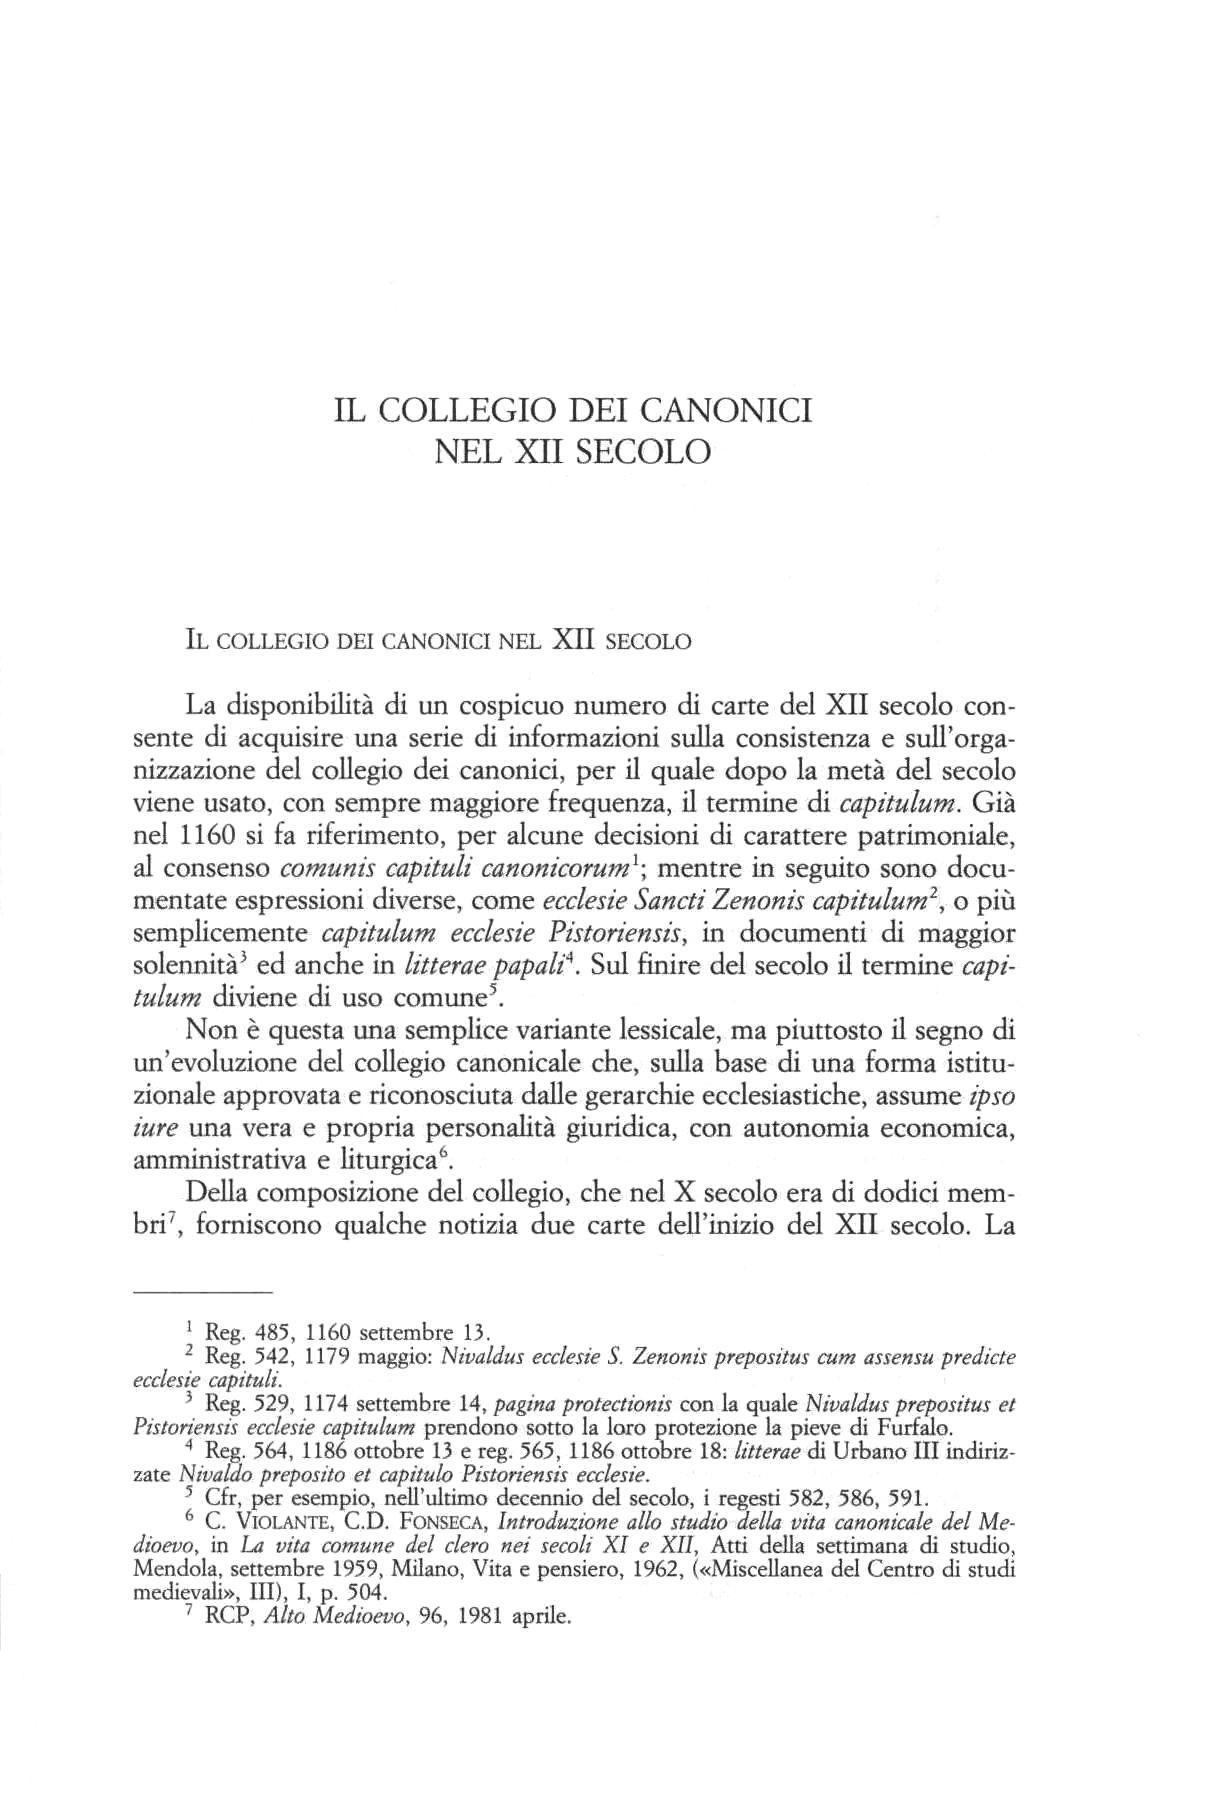 !Canonica S. Zenone XII 00023.jpg